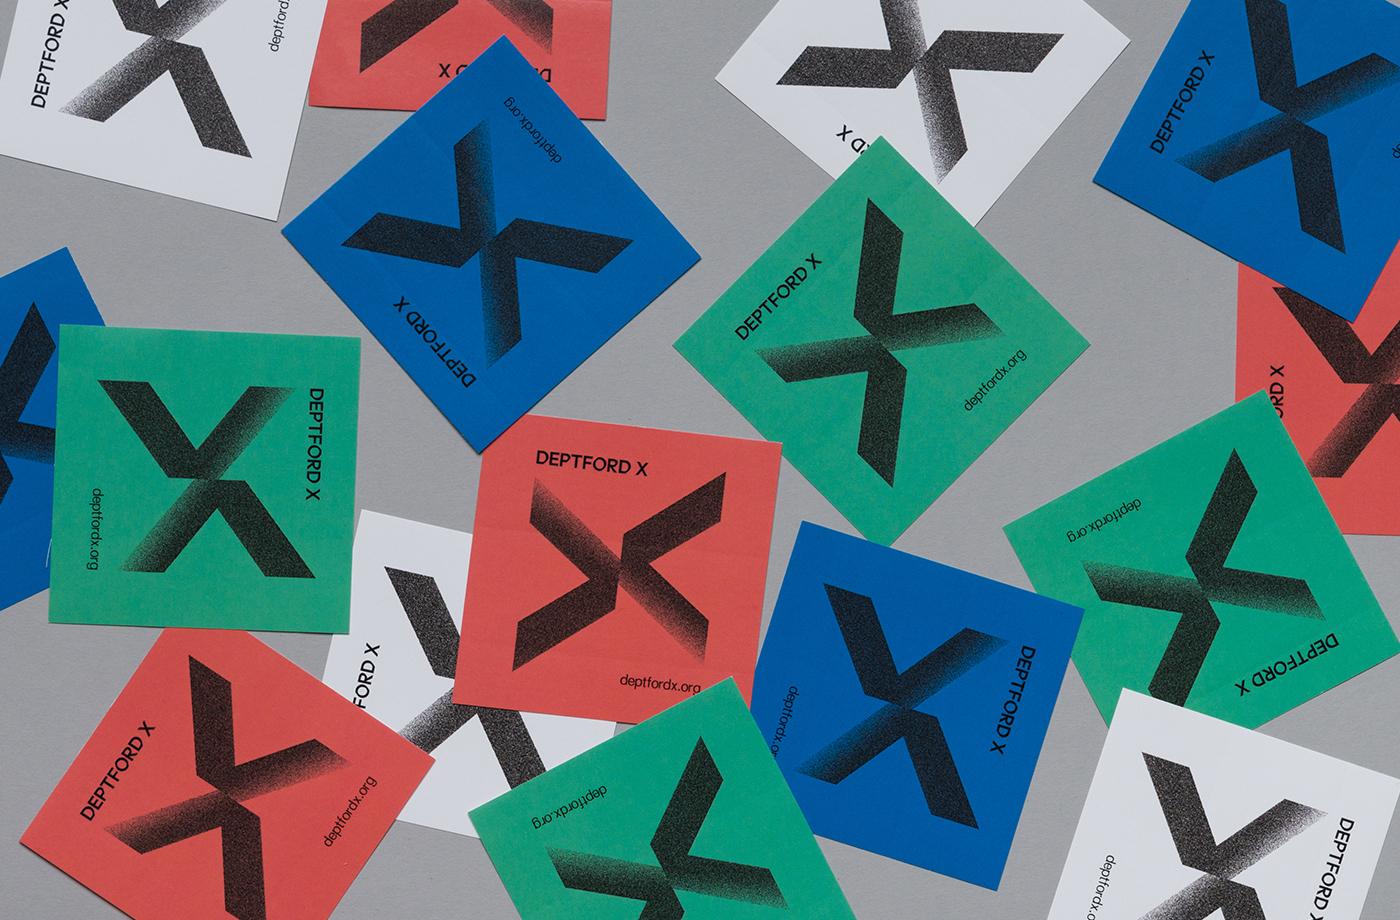 Deptford X品牌视觉形象设计-2